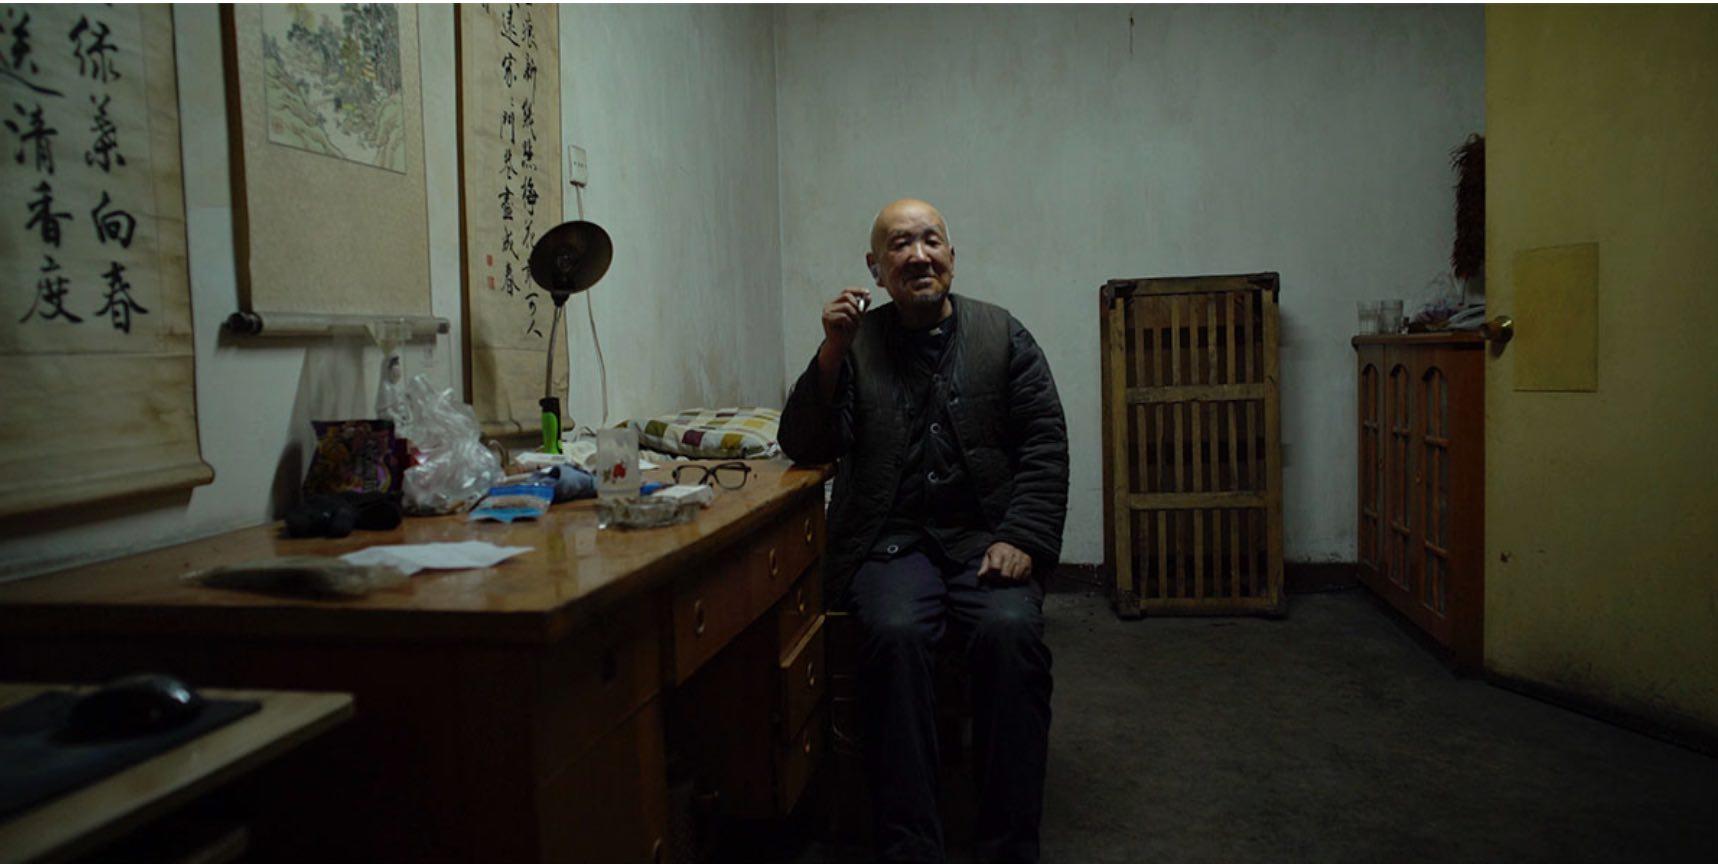 Wang Bing China Re-education